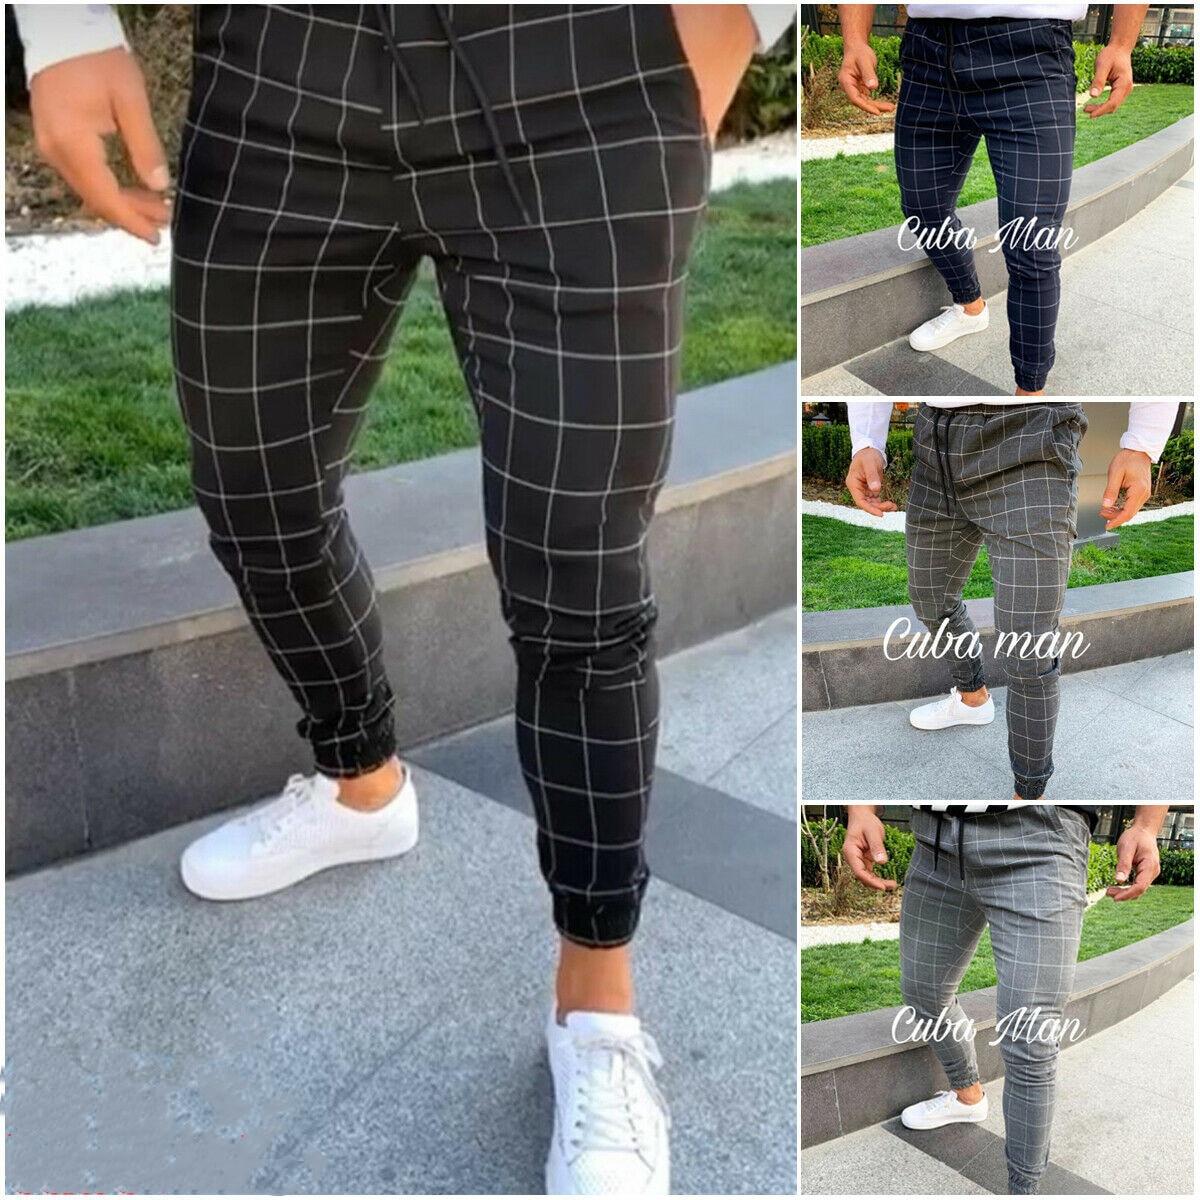 2019 Brand New Fashion Men's Plaid Twill Jogger Pants Urban Hip Hop Harem Casual Trousers Slim